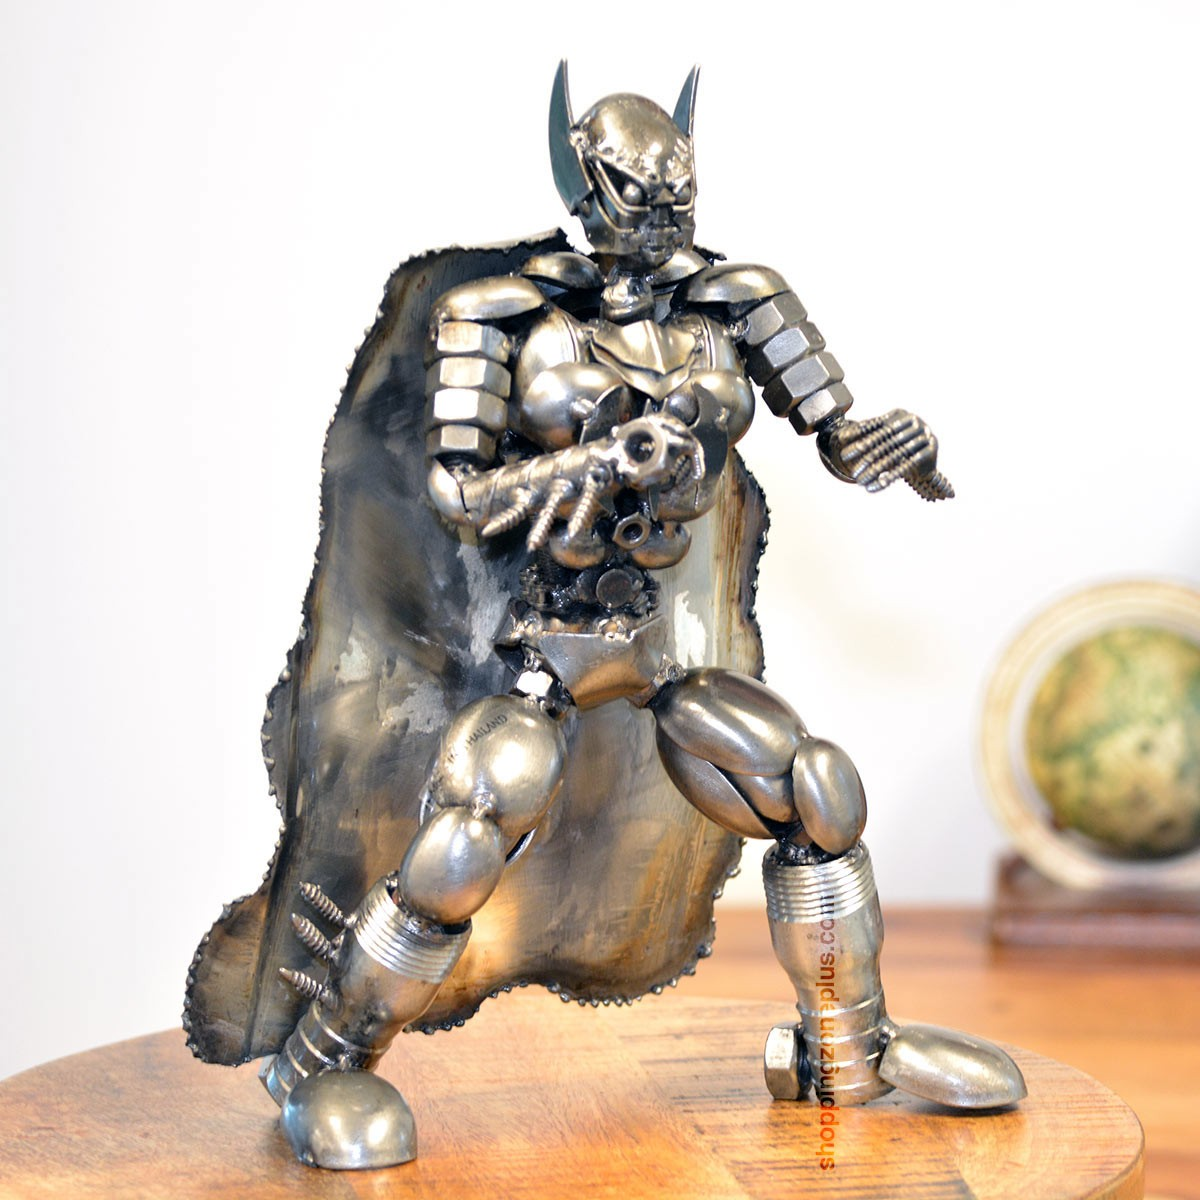 Batman metal sculpture marvel warrior model recycled